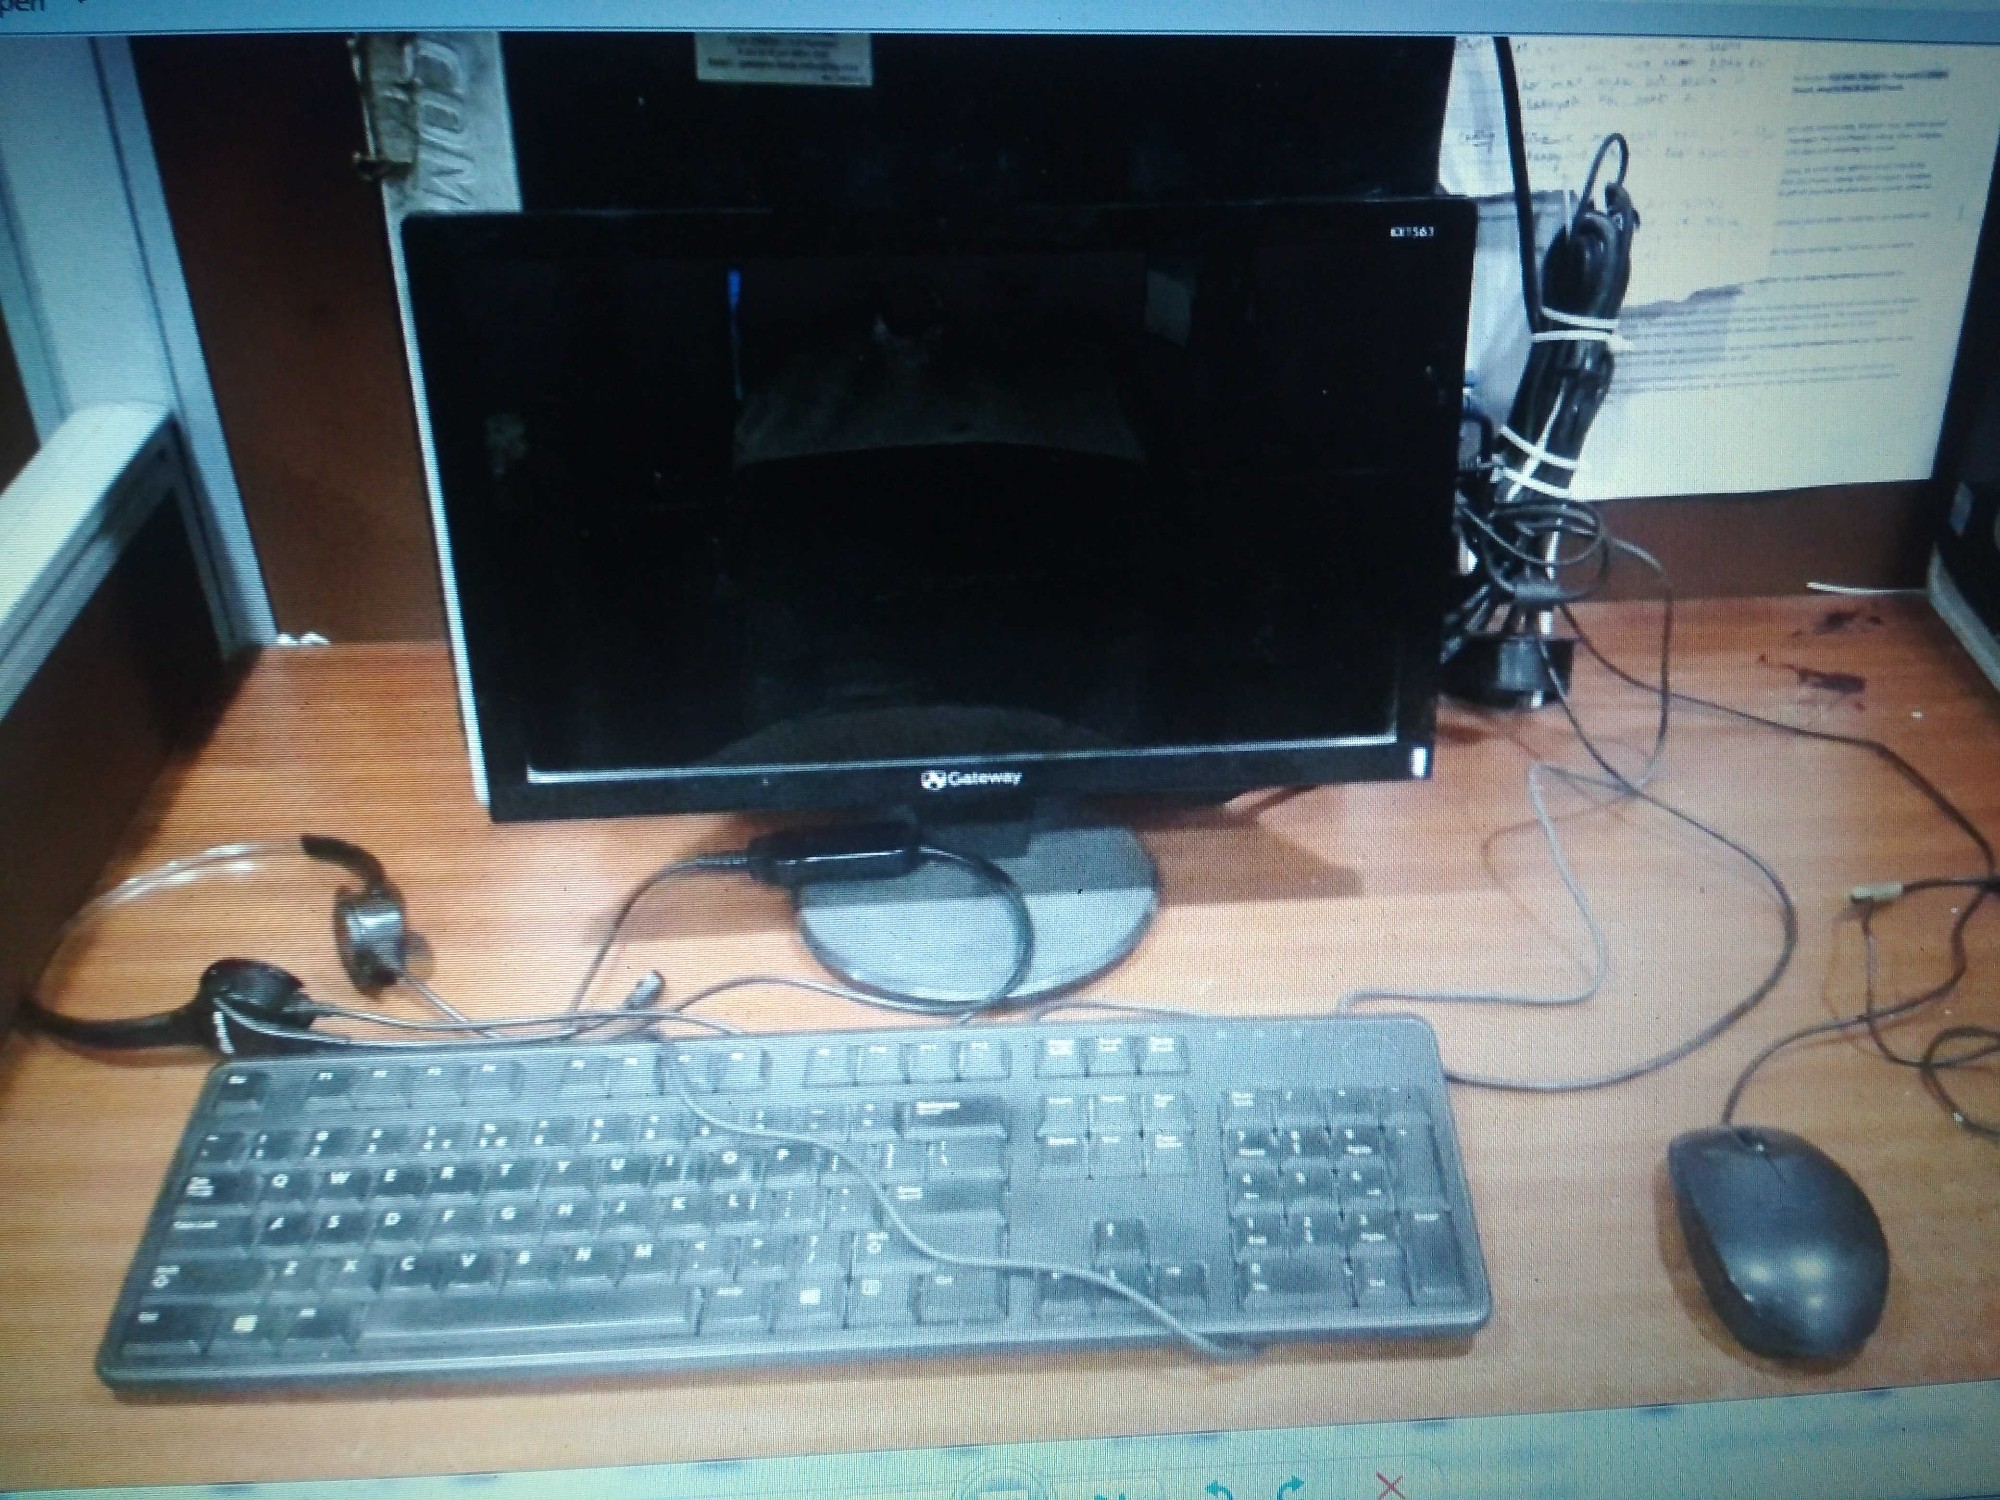 Top 10 HP Computer Printer Repair Services in Ghaziabad